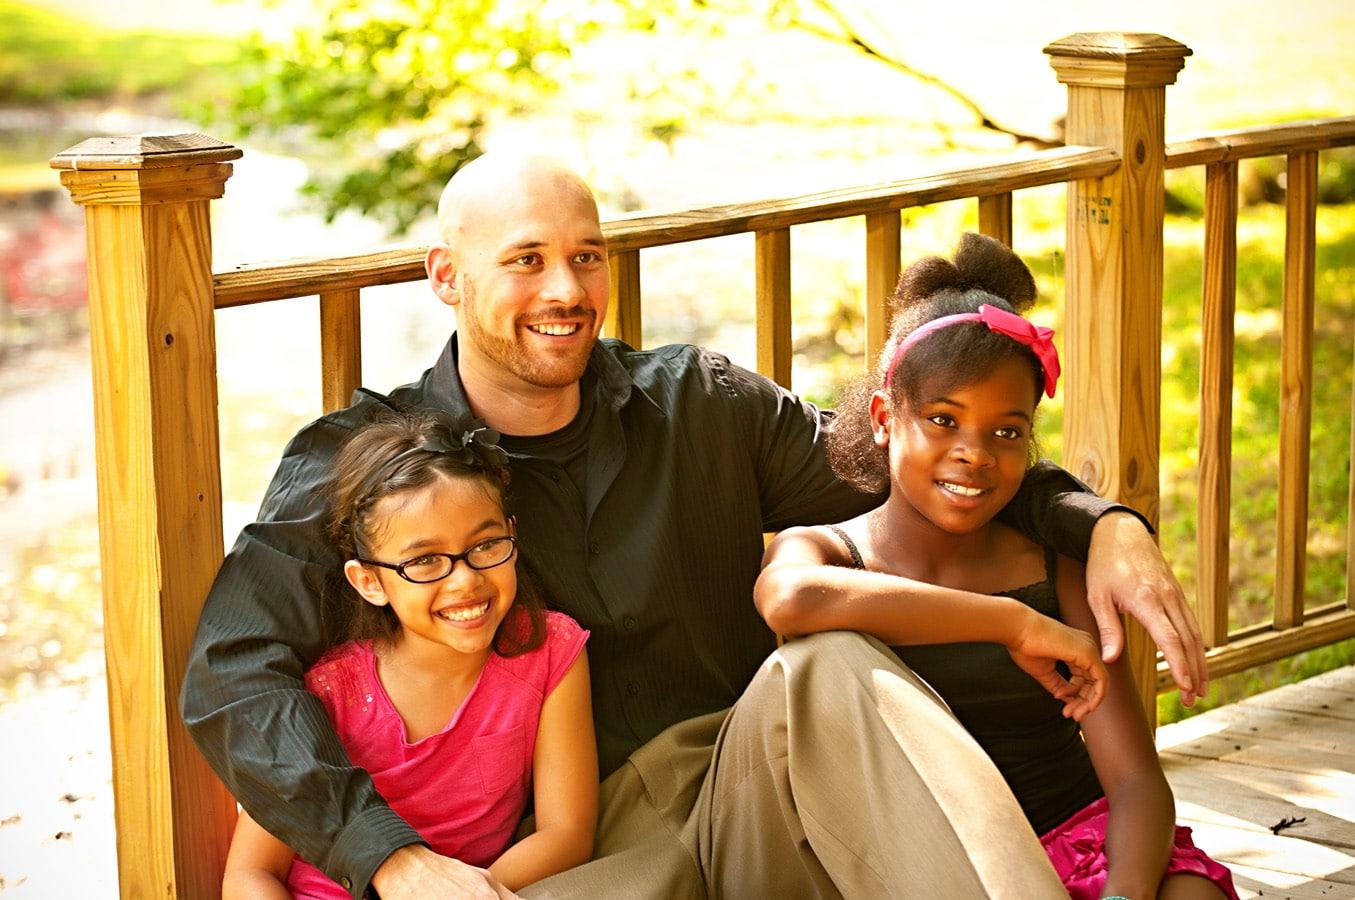 family portrait, bridge, outdoor, natural light, Northern VA